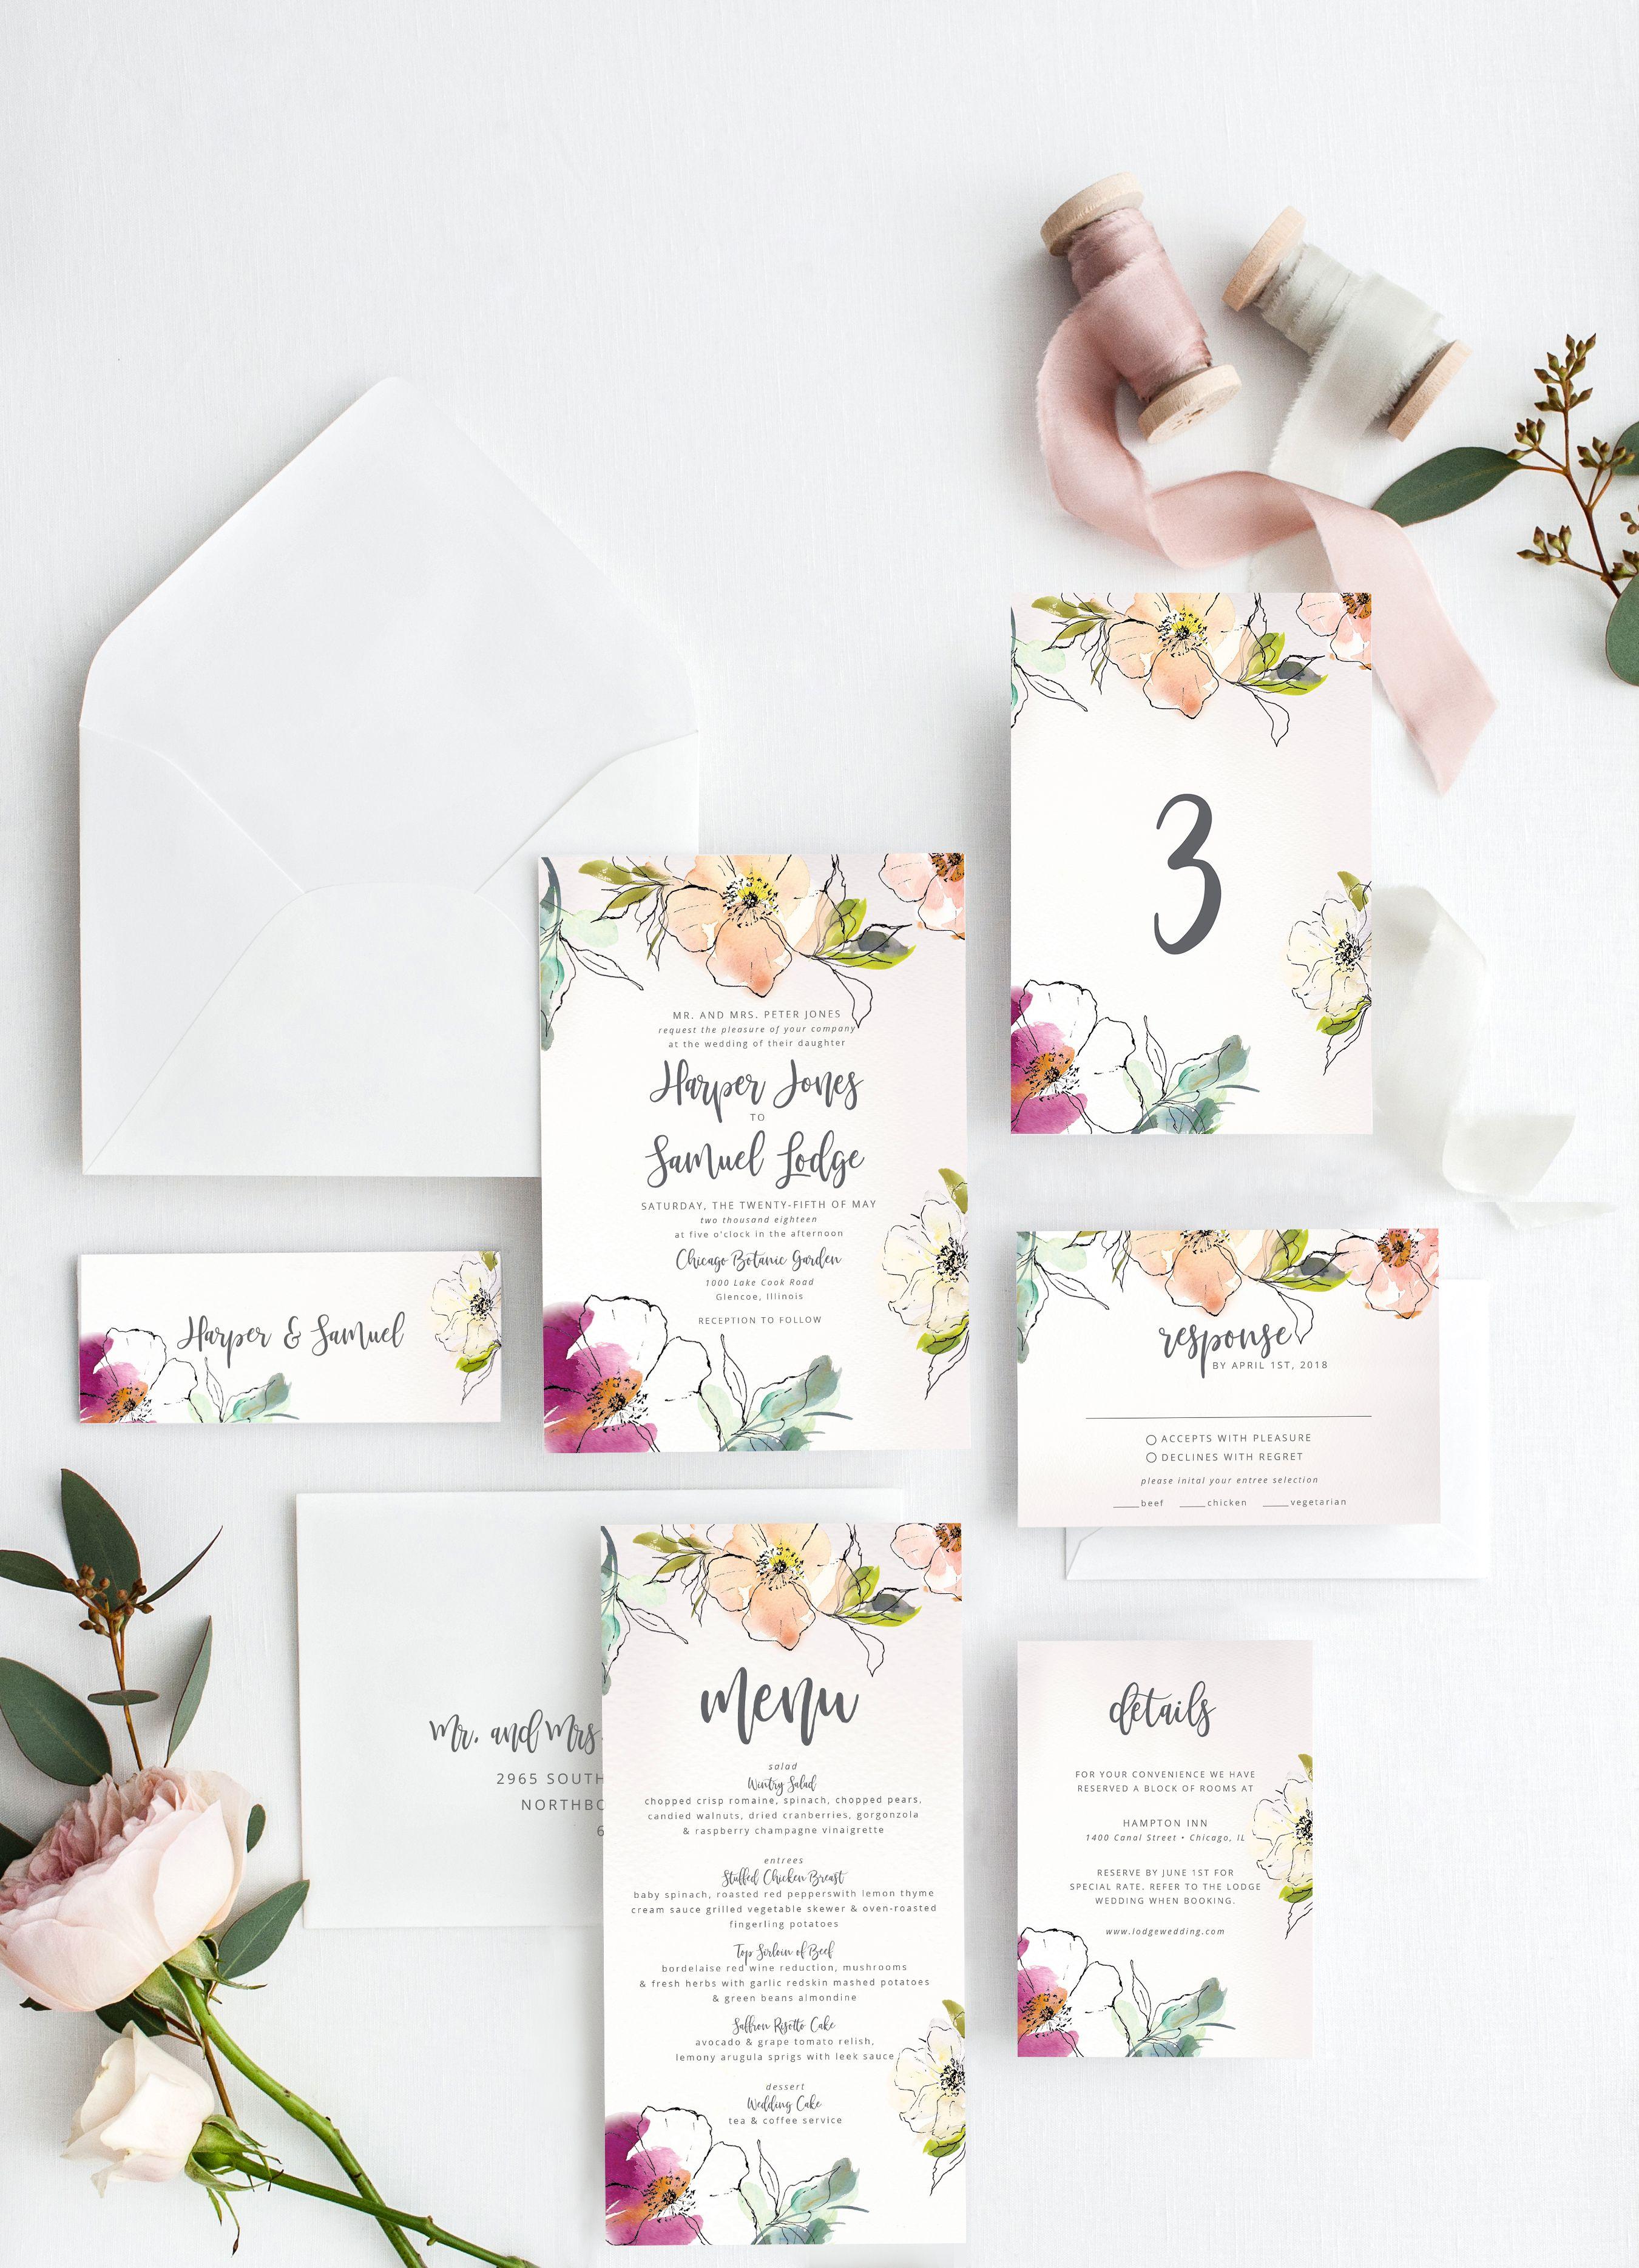 Watercolor Wedding Invitation Templates At GetDrawings